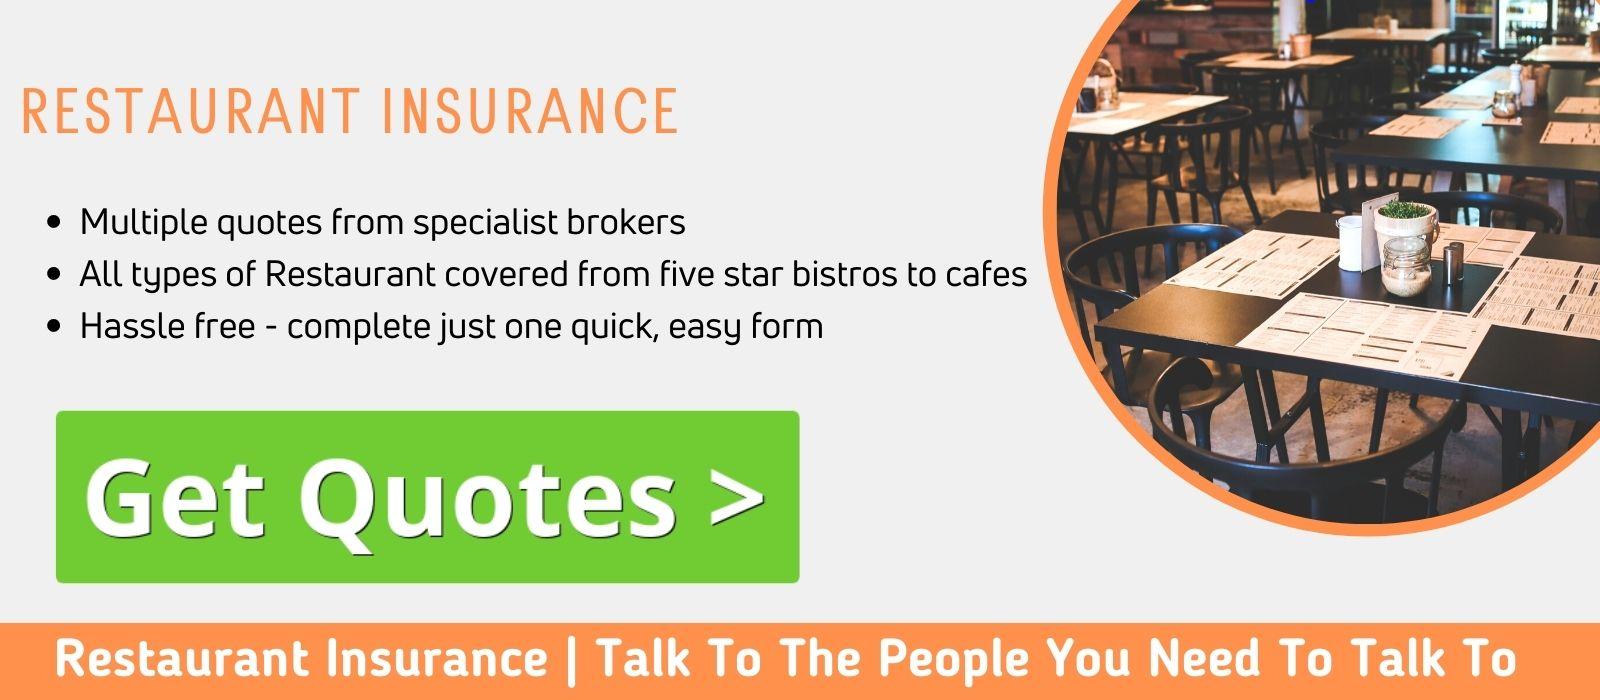 Restaurant Insurance Comparison